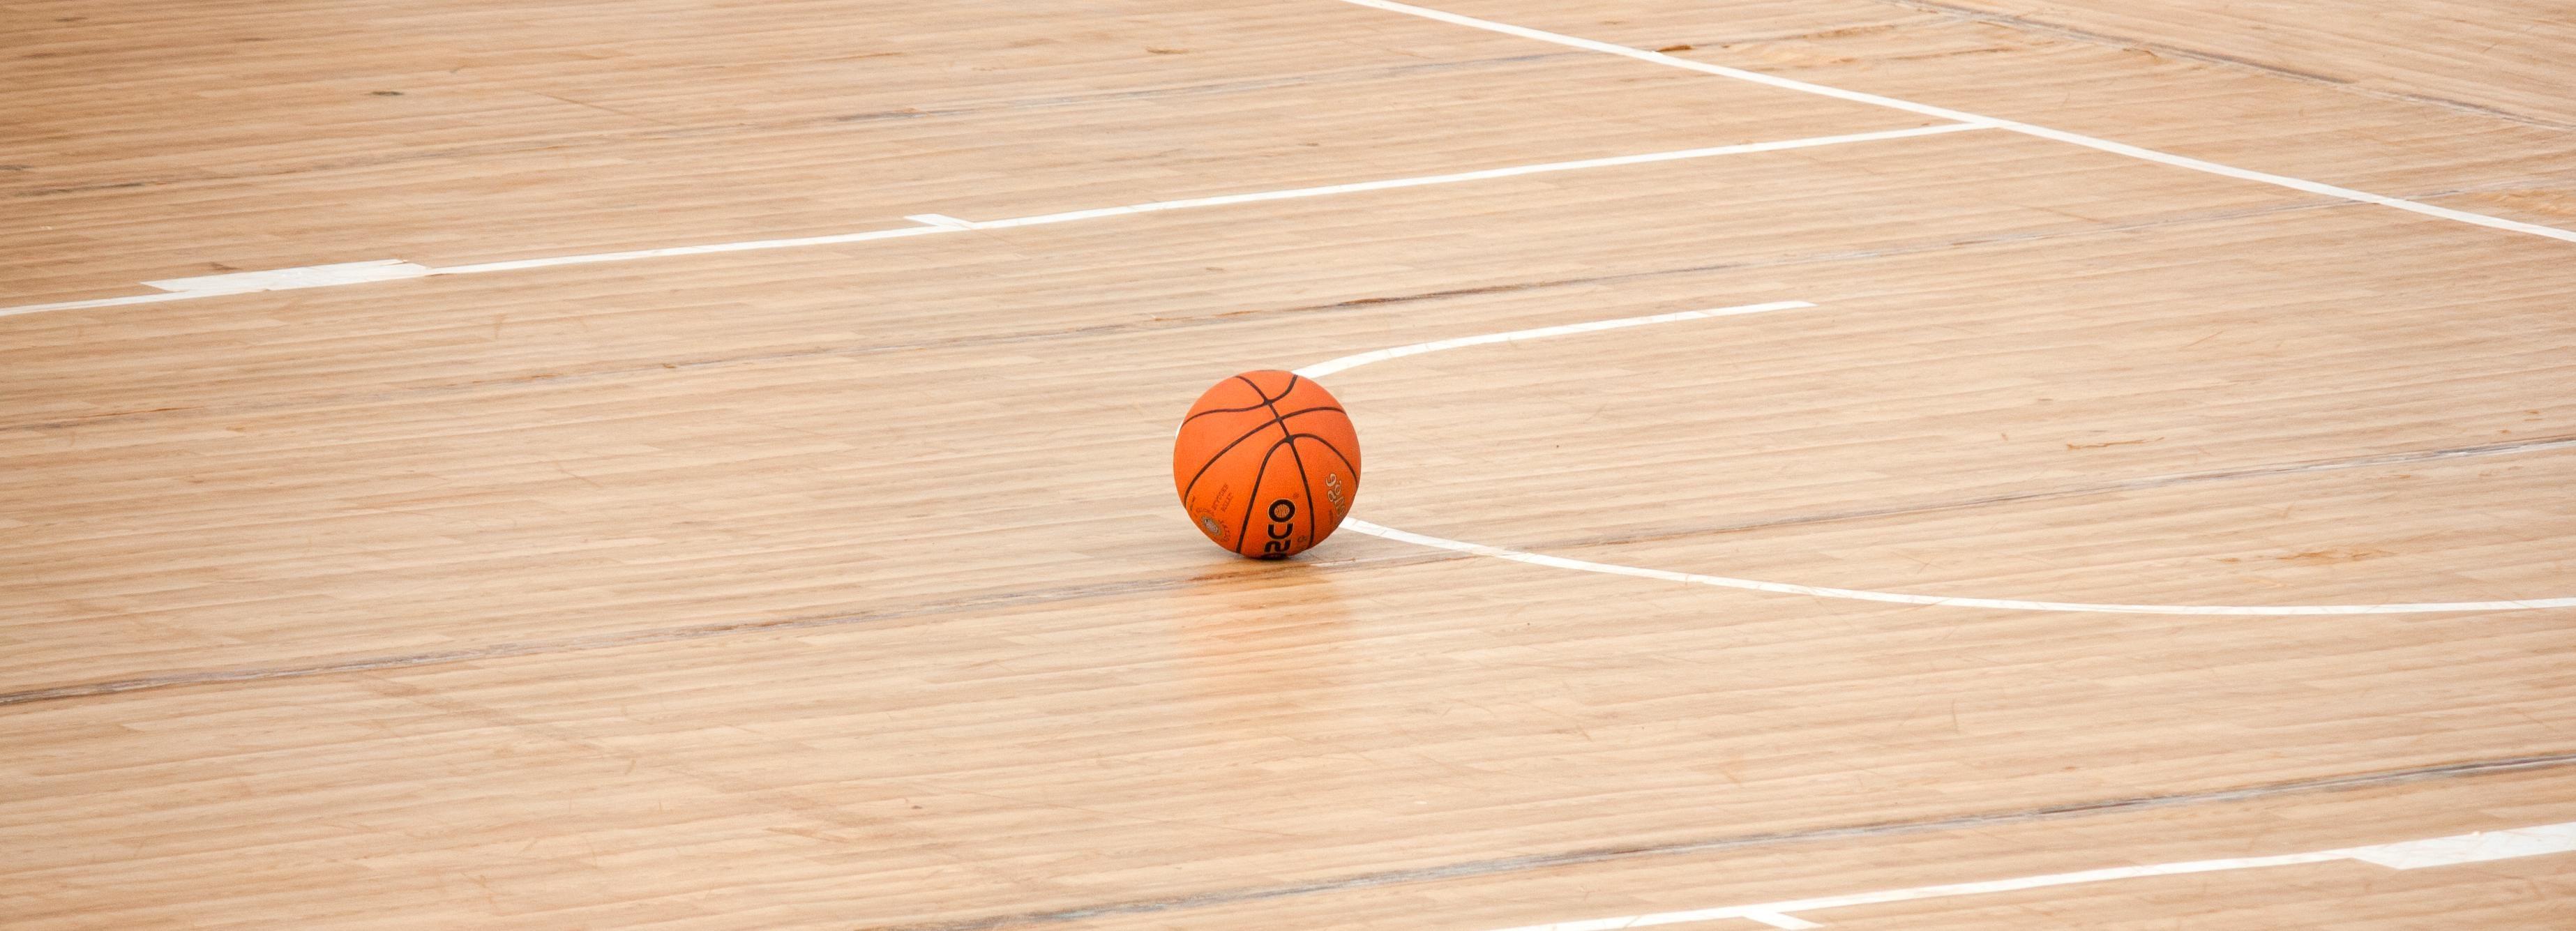 info e european starting consumption to texture global vertical woodflooring stock shot wood flooring basketball overhead wooden photo at floors markets recover hardwood floor